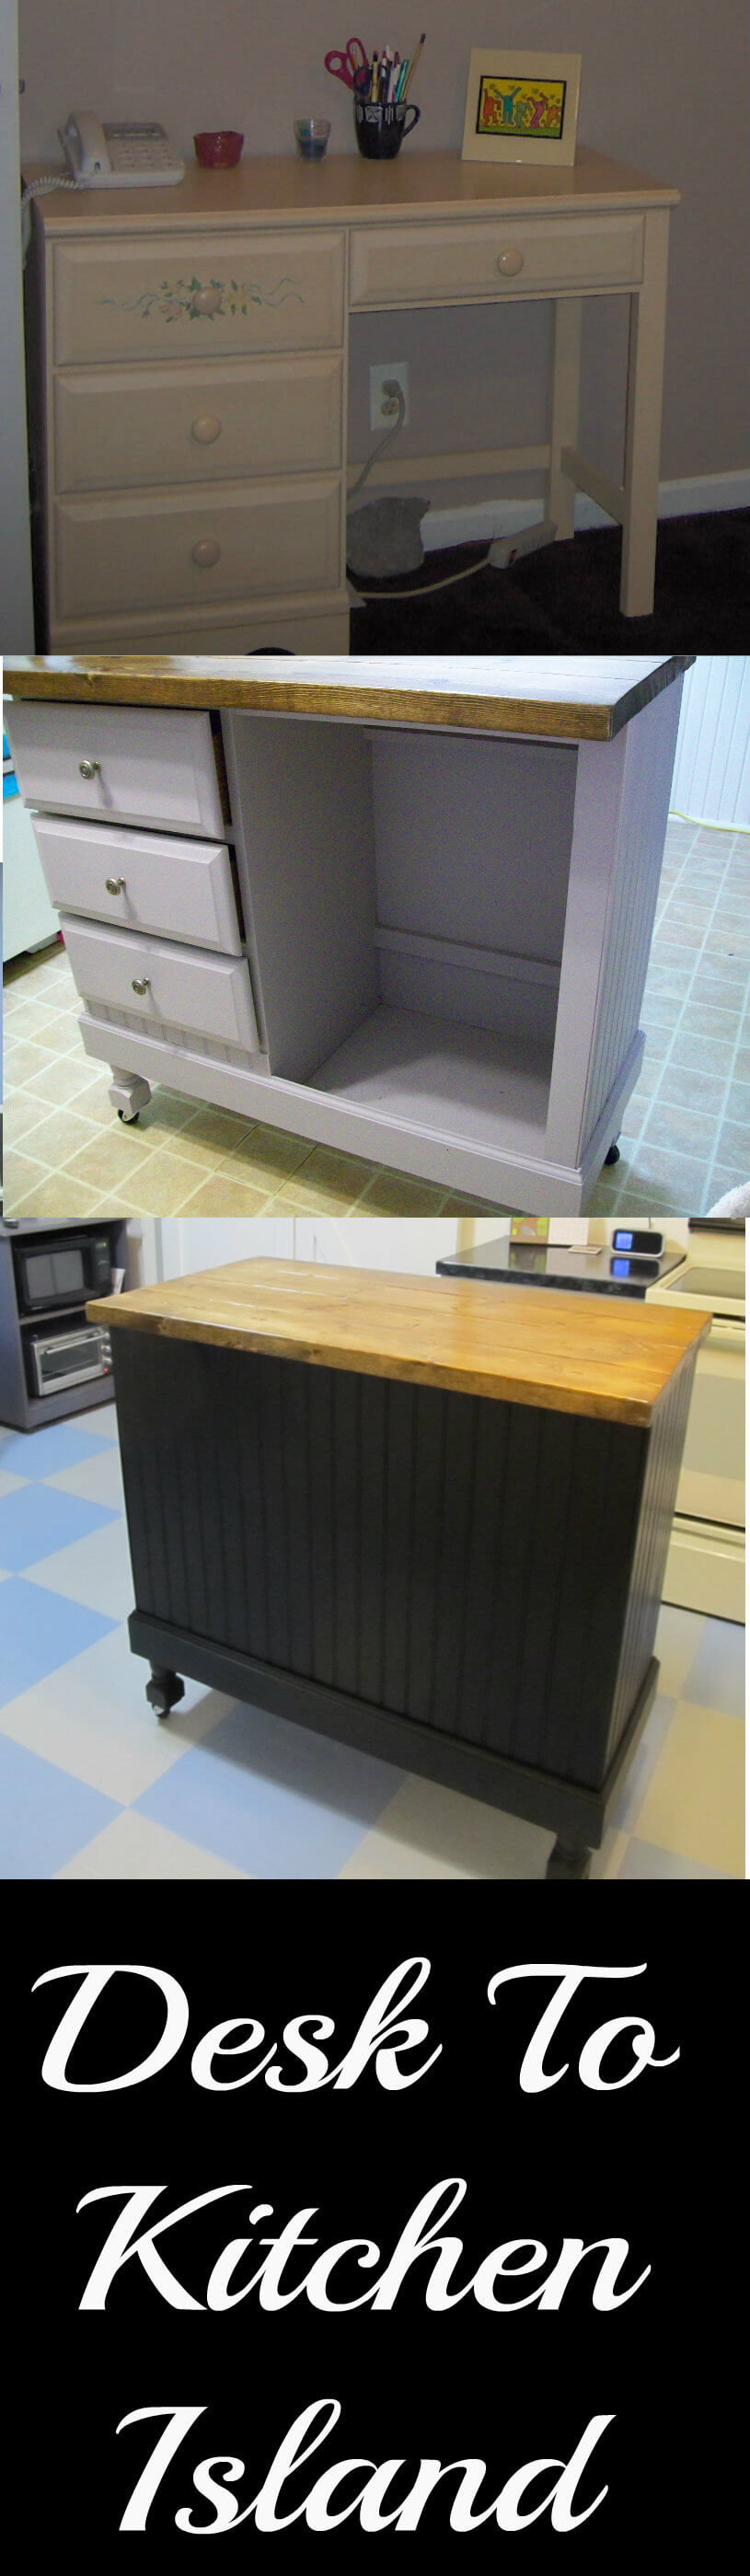 23 Best DIY Kitchen Island Ideas and Designs for 2017